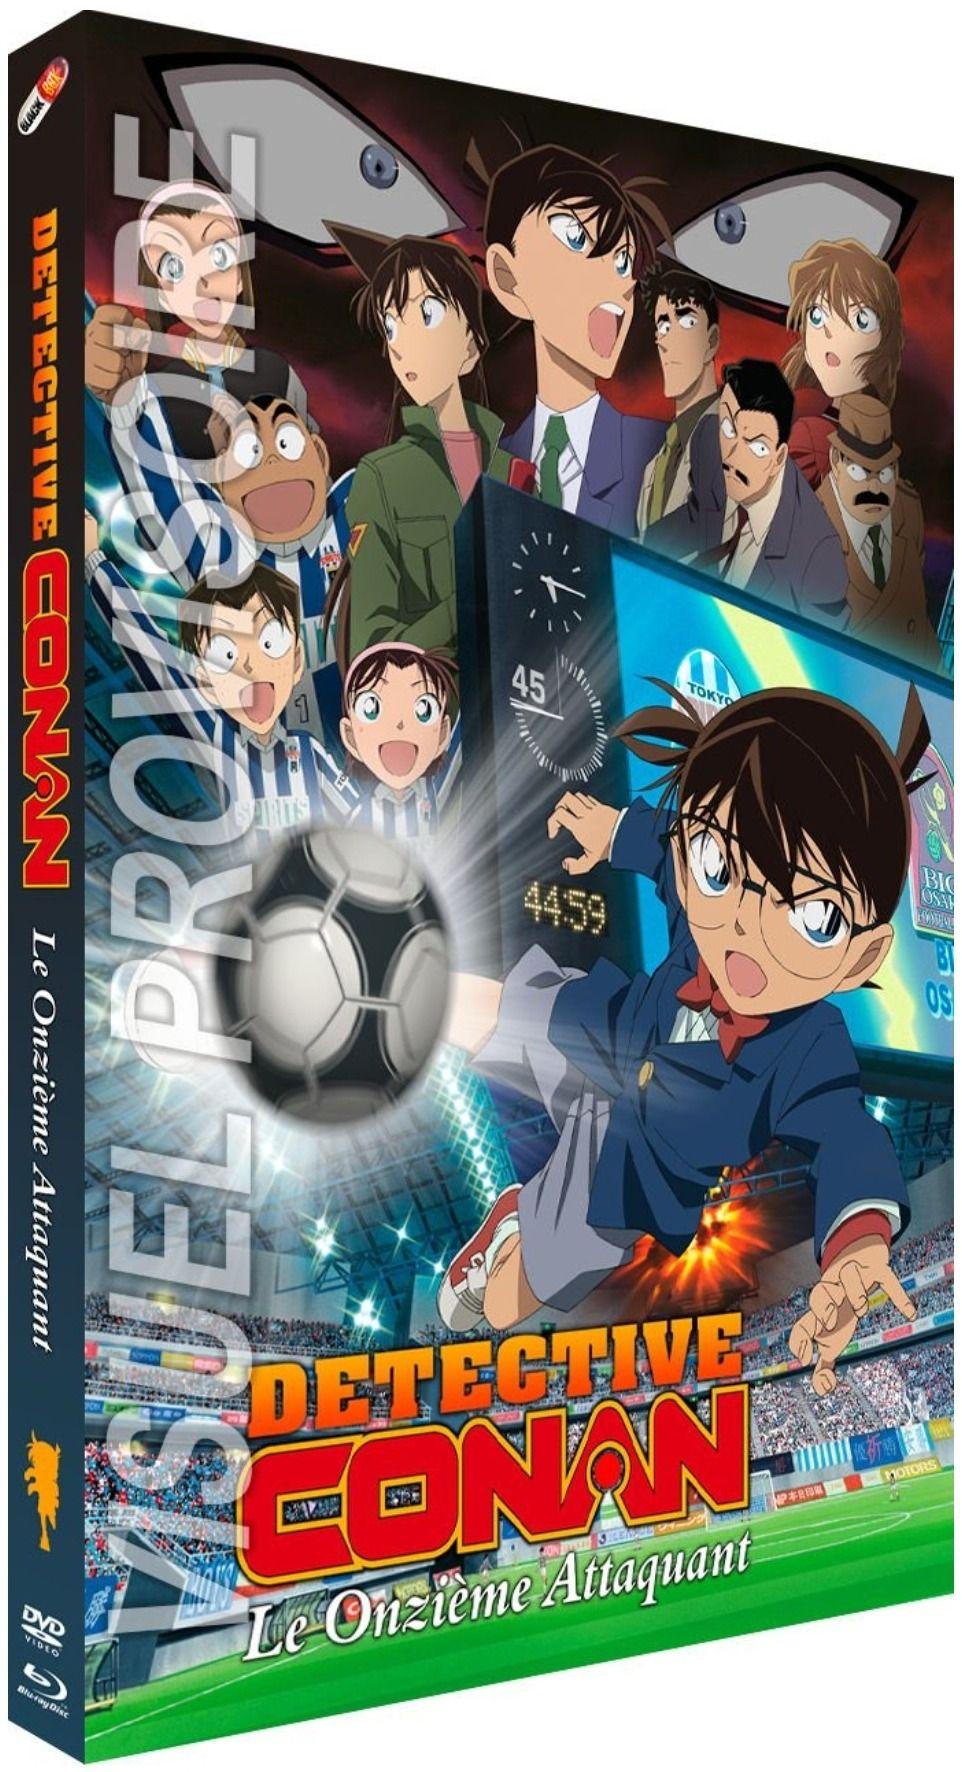 Détective Conan - Film 16 : Le Onzième Attaquant - Combo Blu-ray + DVD